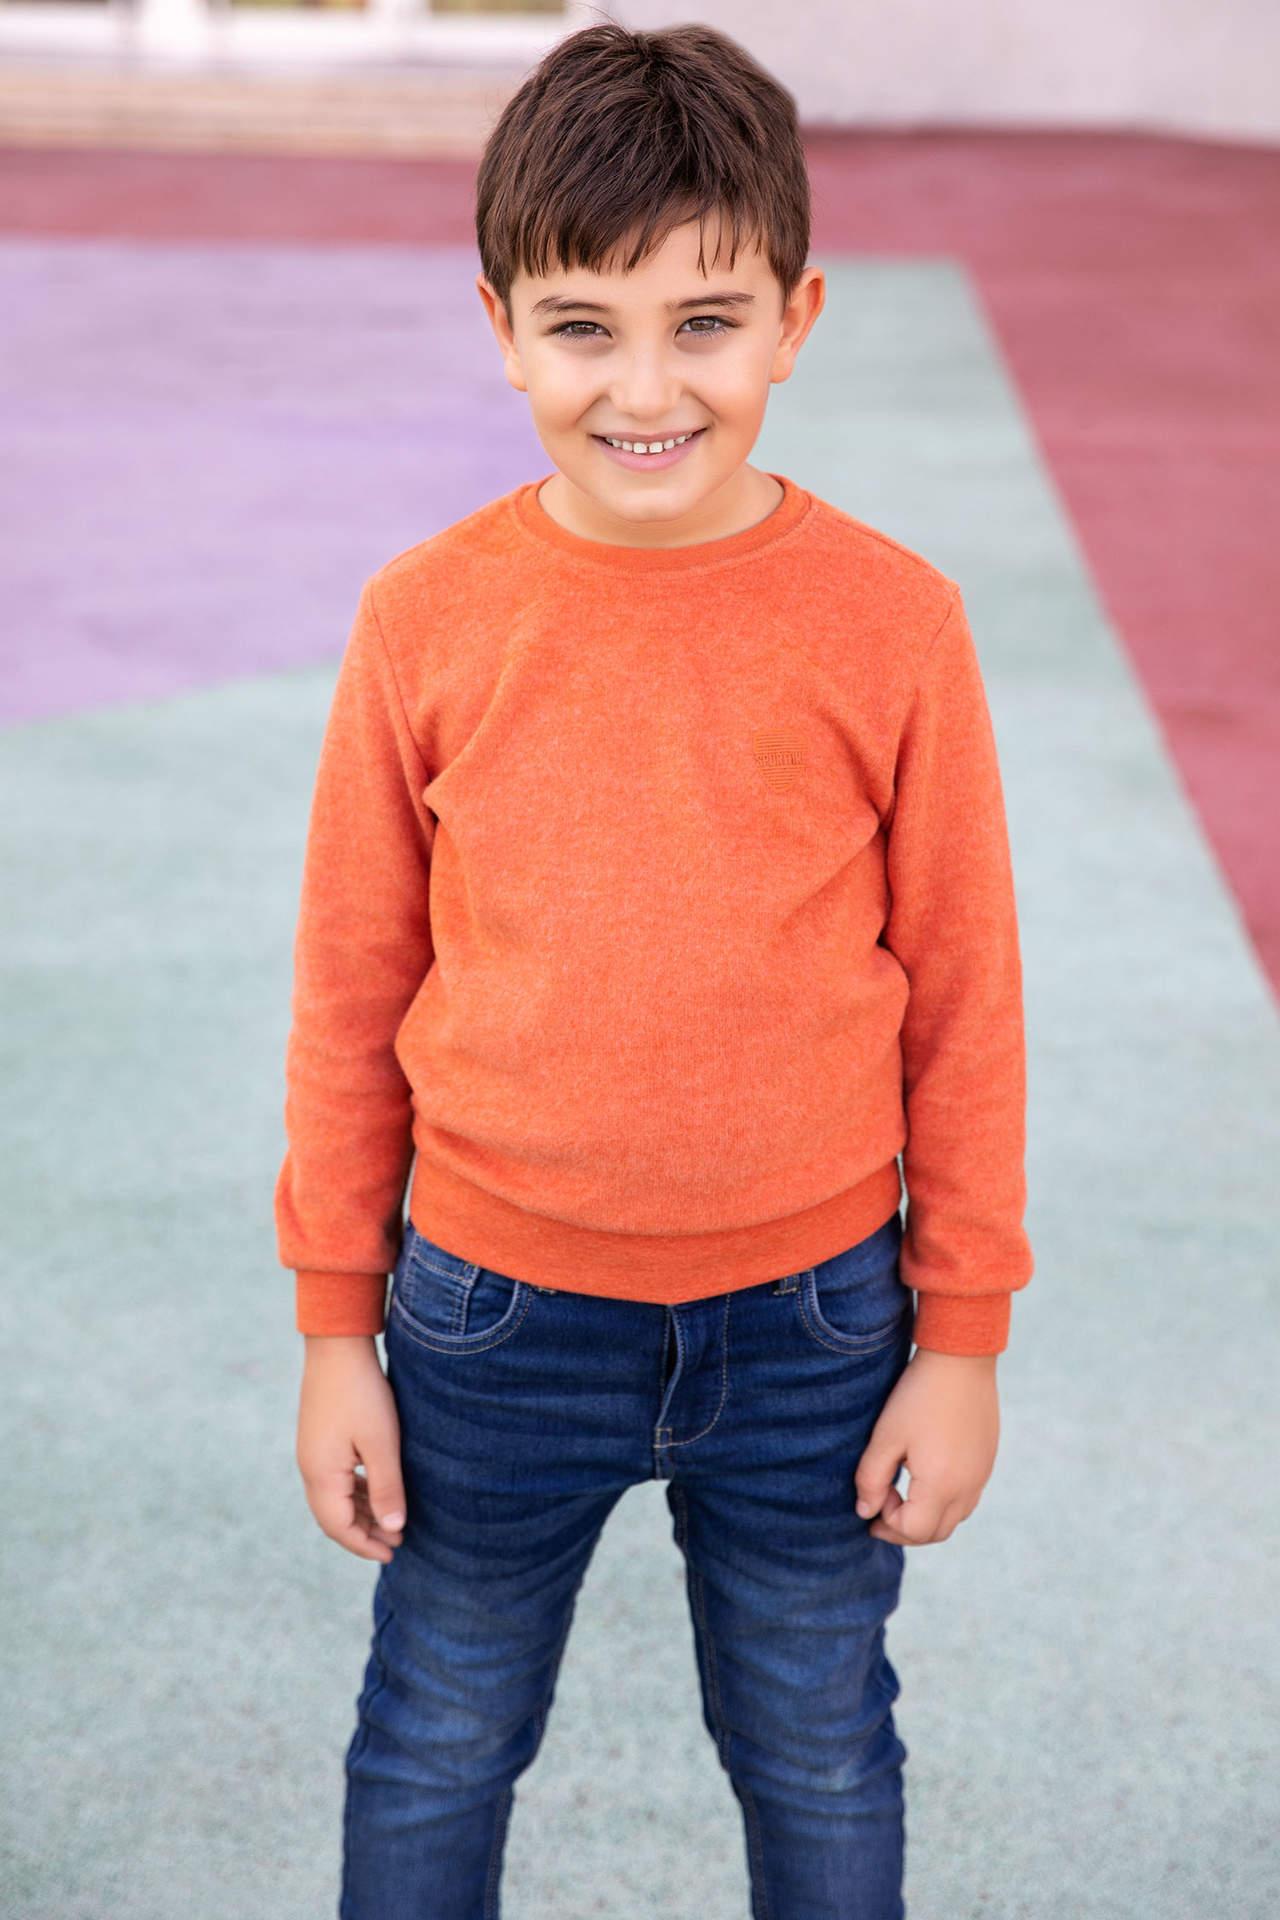 DeFacto Erkek Çocuk Basic Sweatshirt Turuncu male